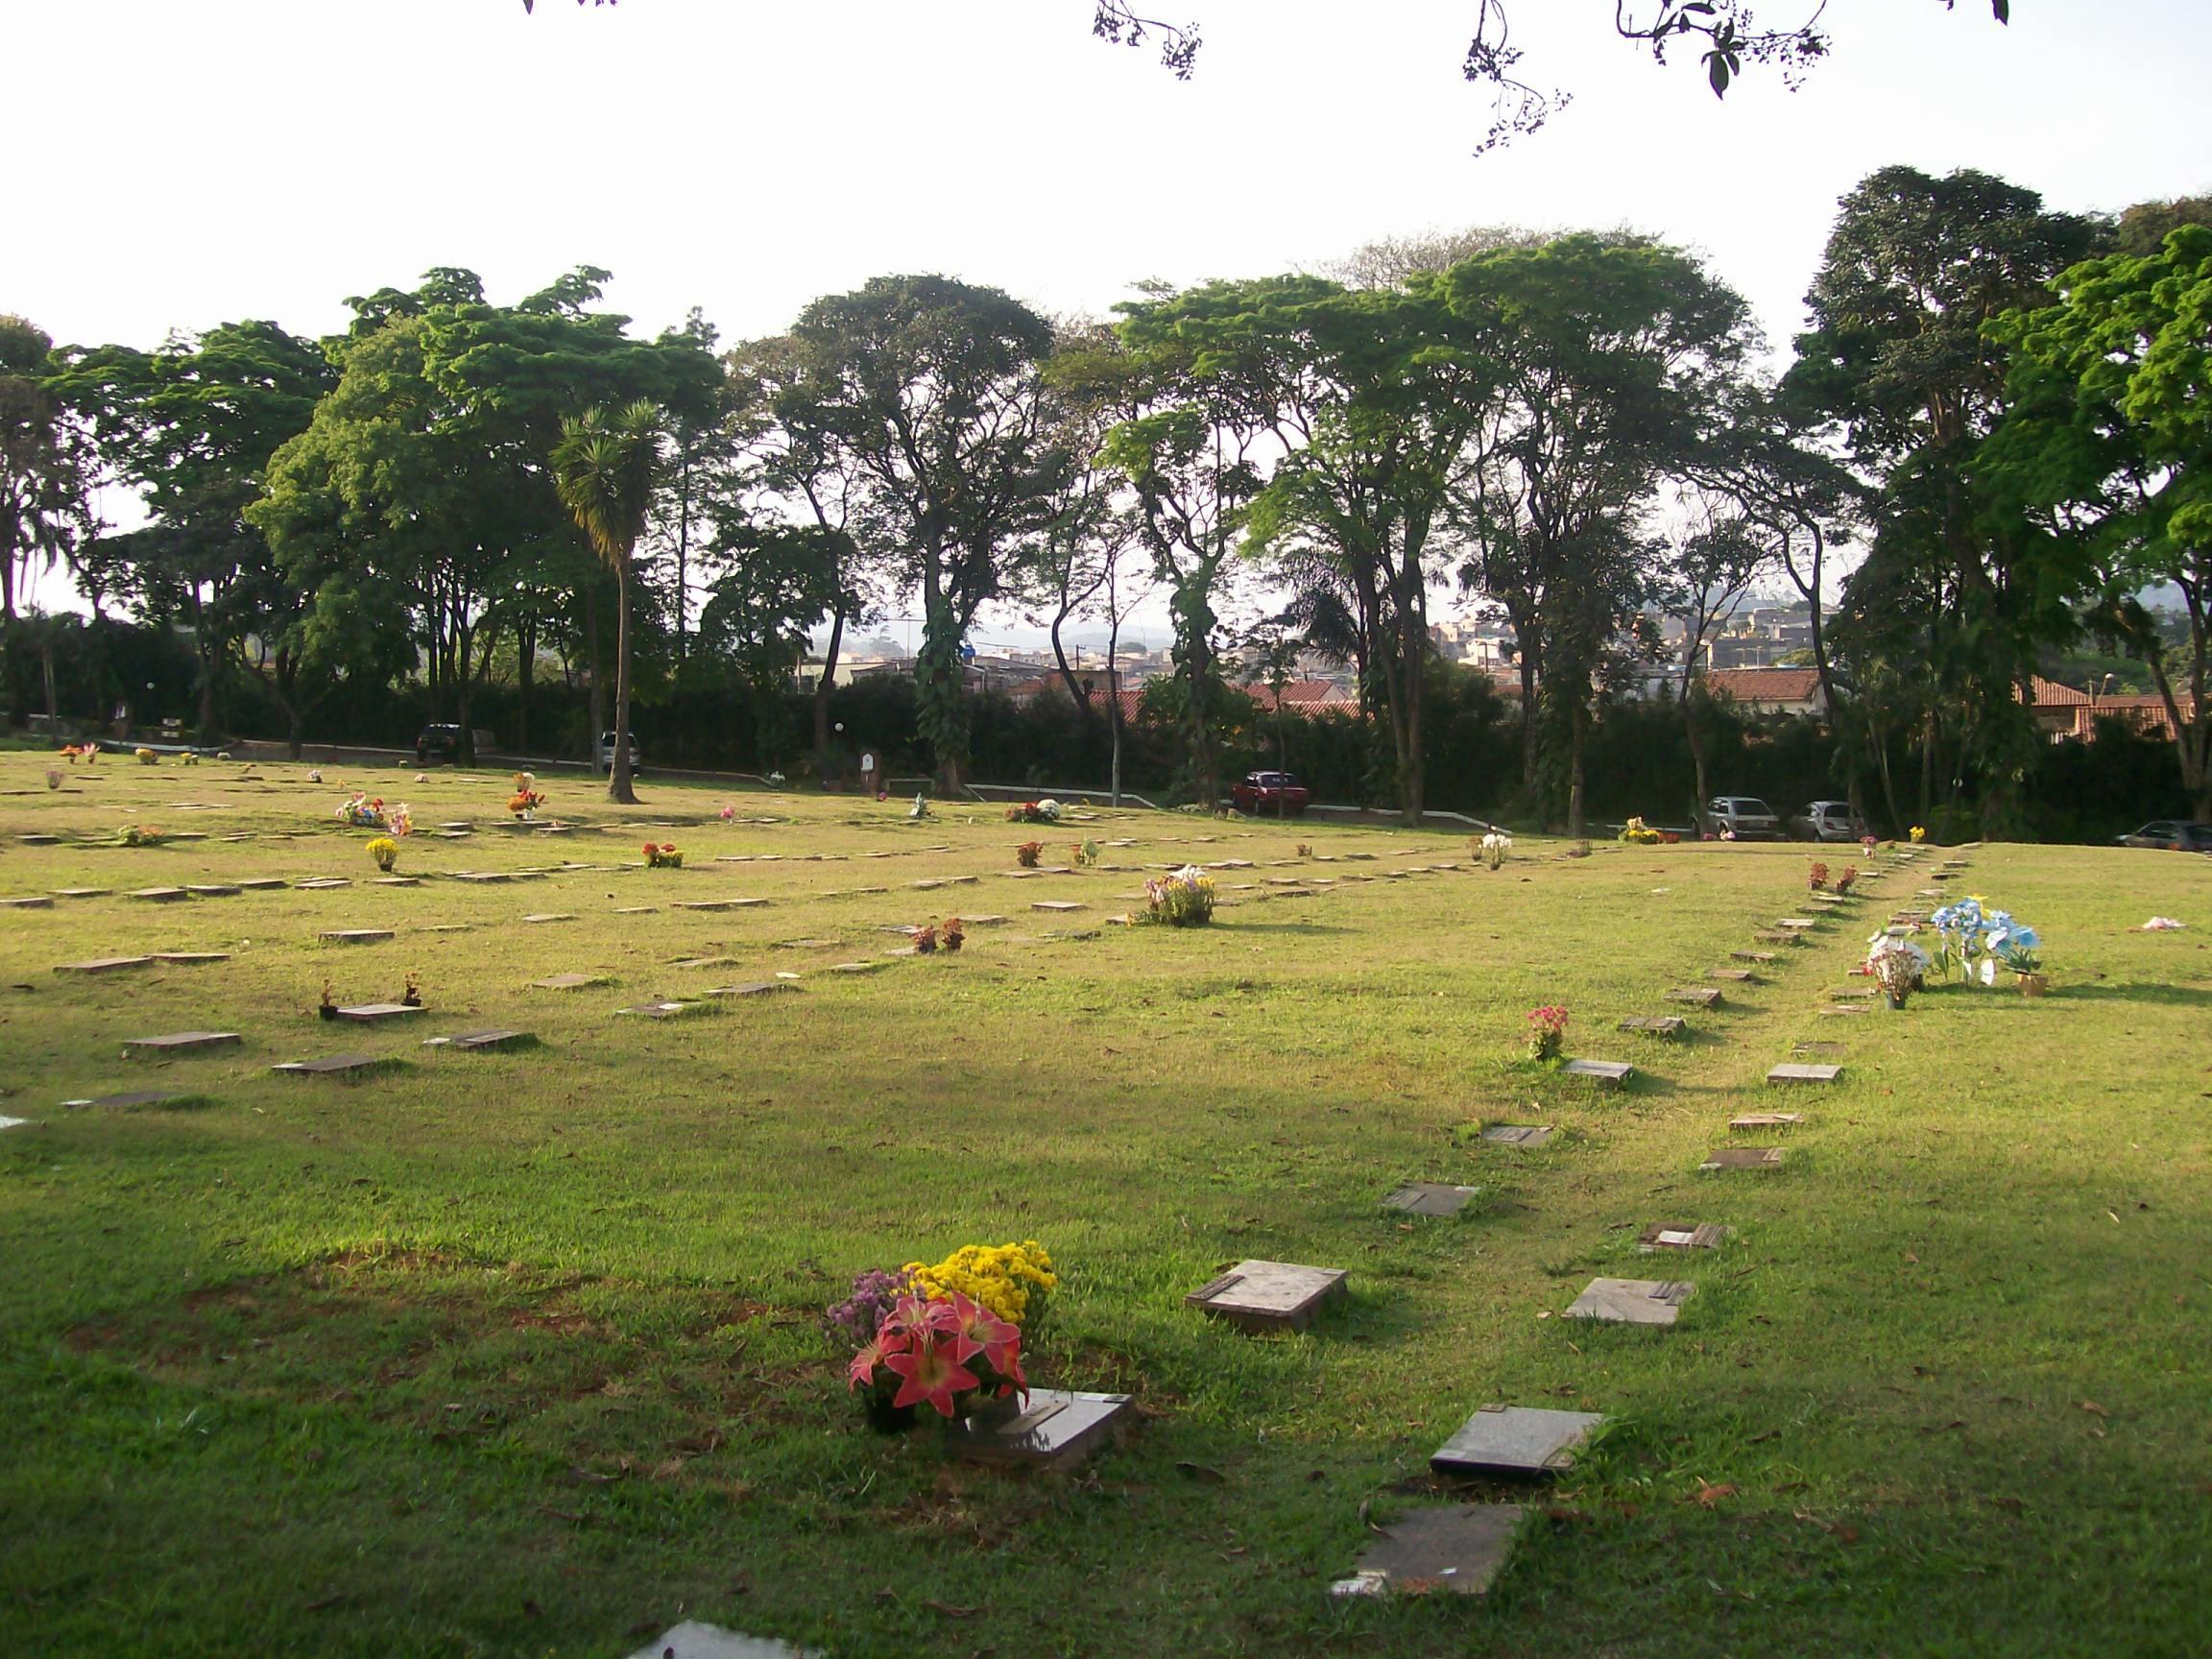 jardim ipe foz do iguacu:Floricultura Cemitério Municipal Jardim São Paulo Foz do Iguaçu